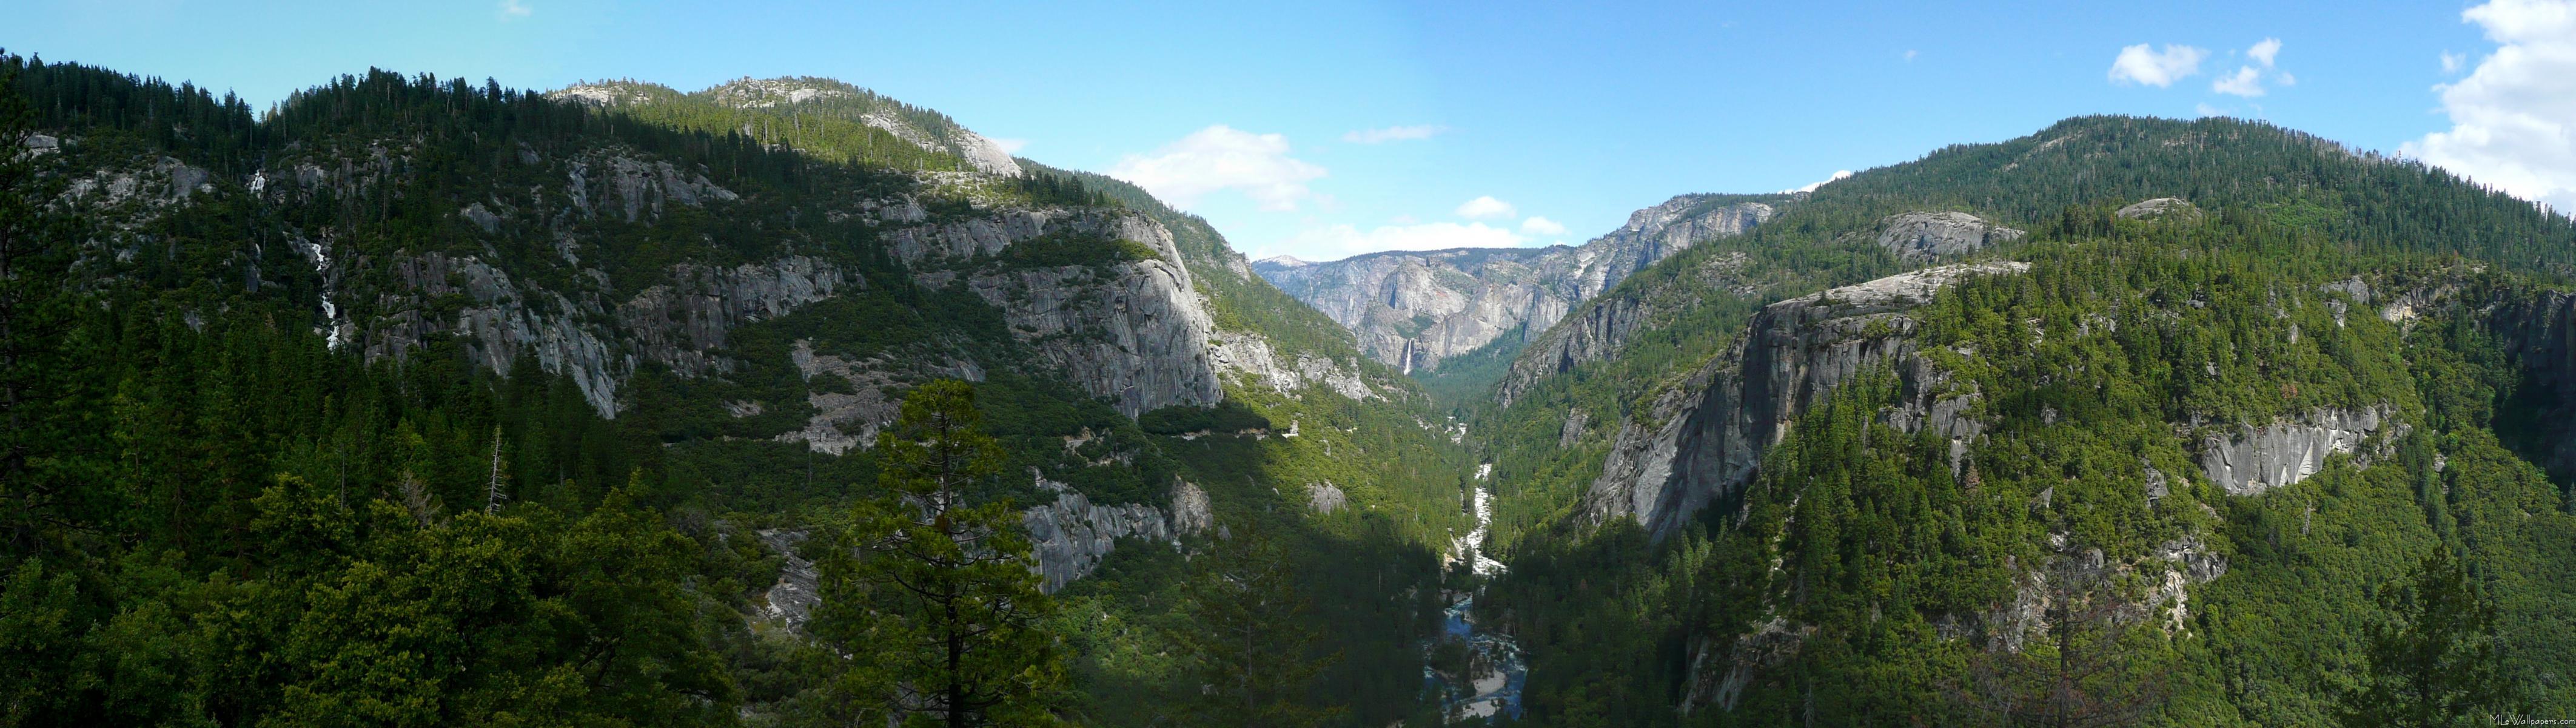 MLeWallpapers.com - Yosemite Valley